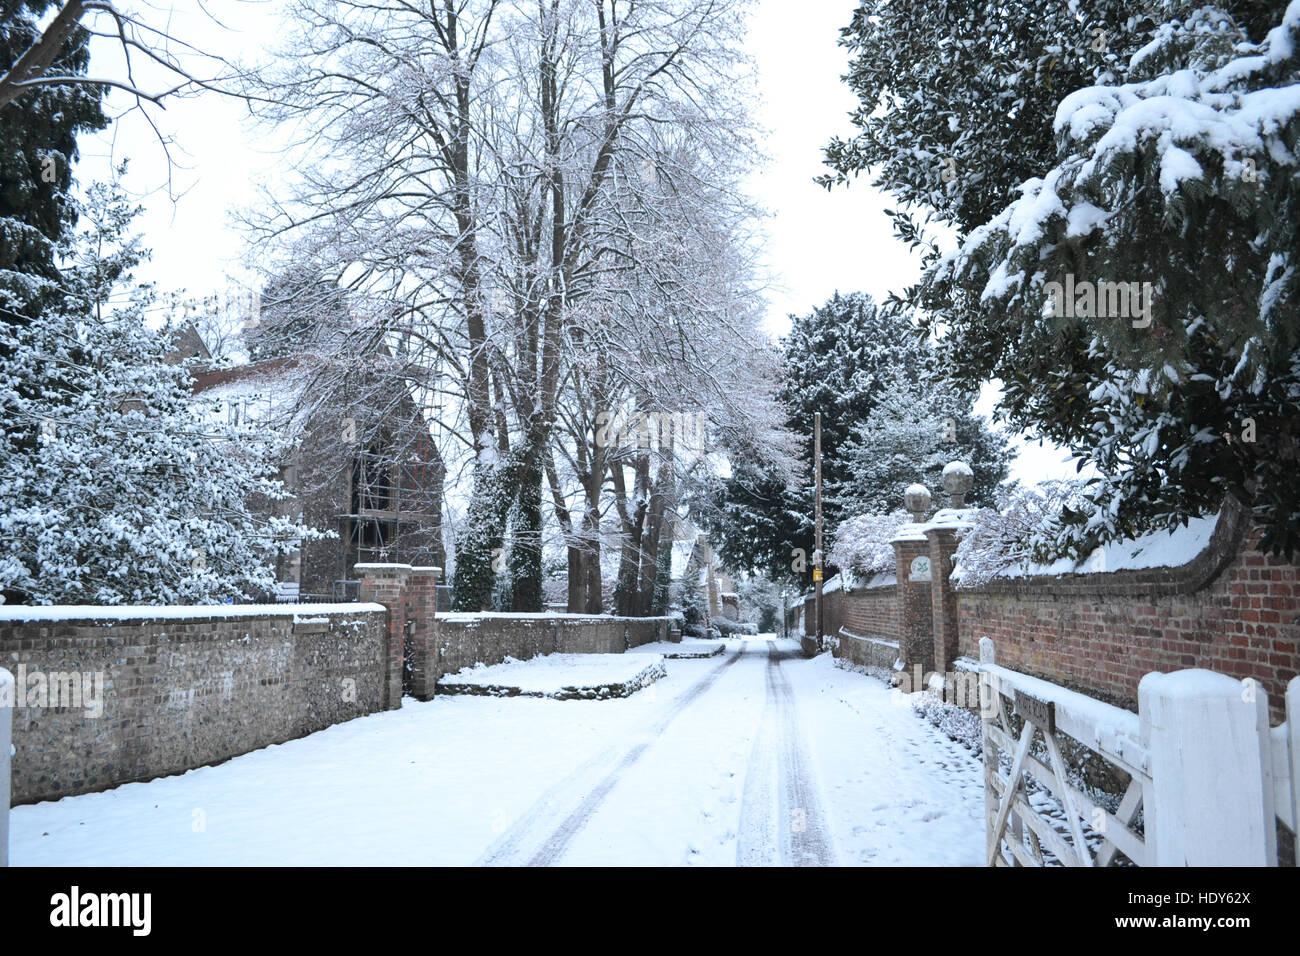 Church Lane, Princes Risborough, in snow. Buckinghamshire, Chilterns, UK - Stock Image